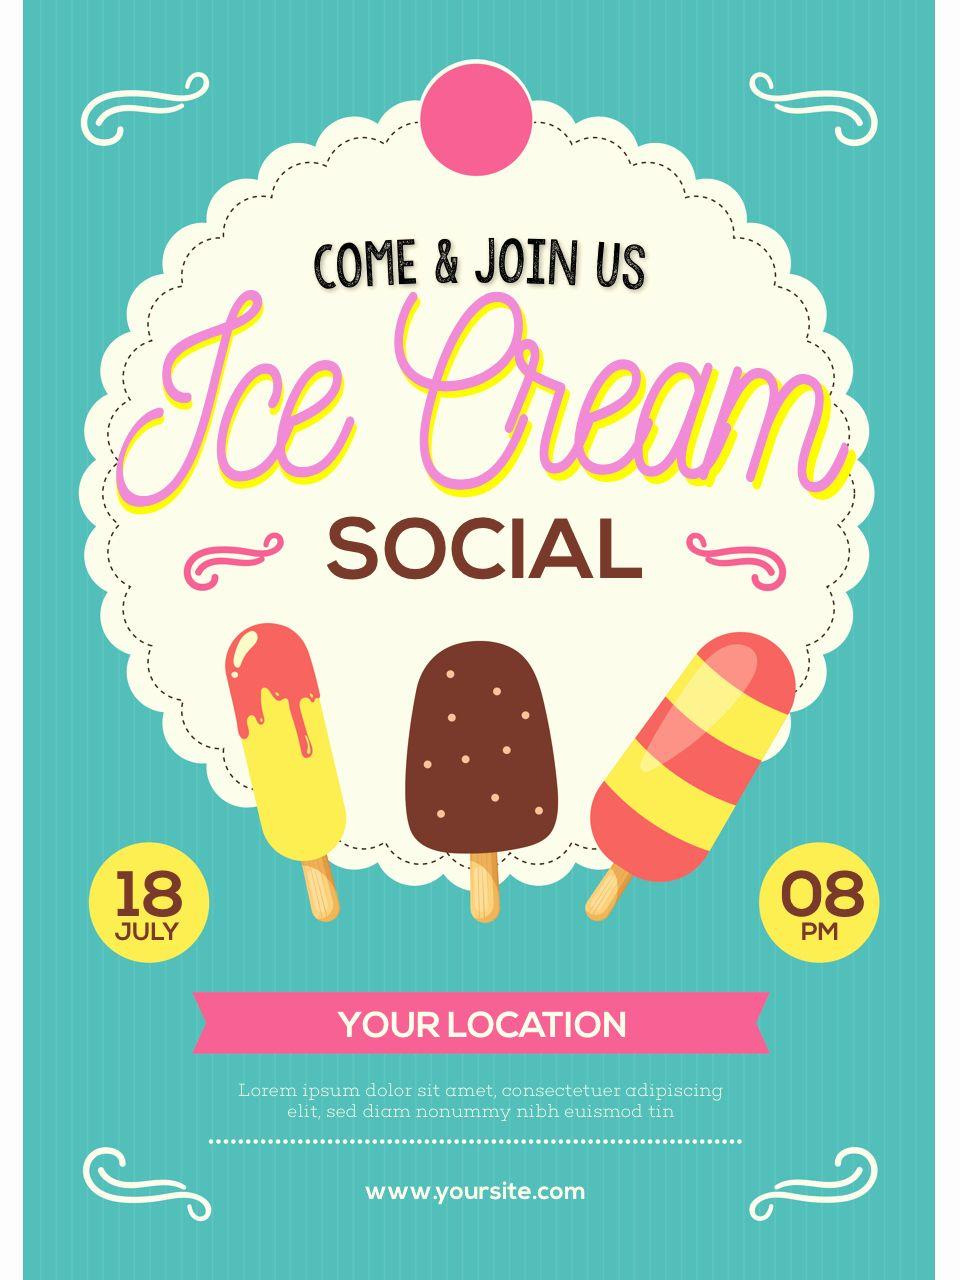 Ice Cream Social Flyer Template Free Elegant Ice Cream Social Flyer Ice Cream Social Ice Cream Party Flyer